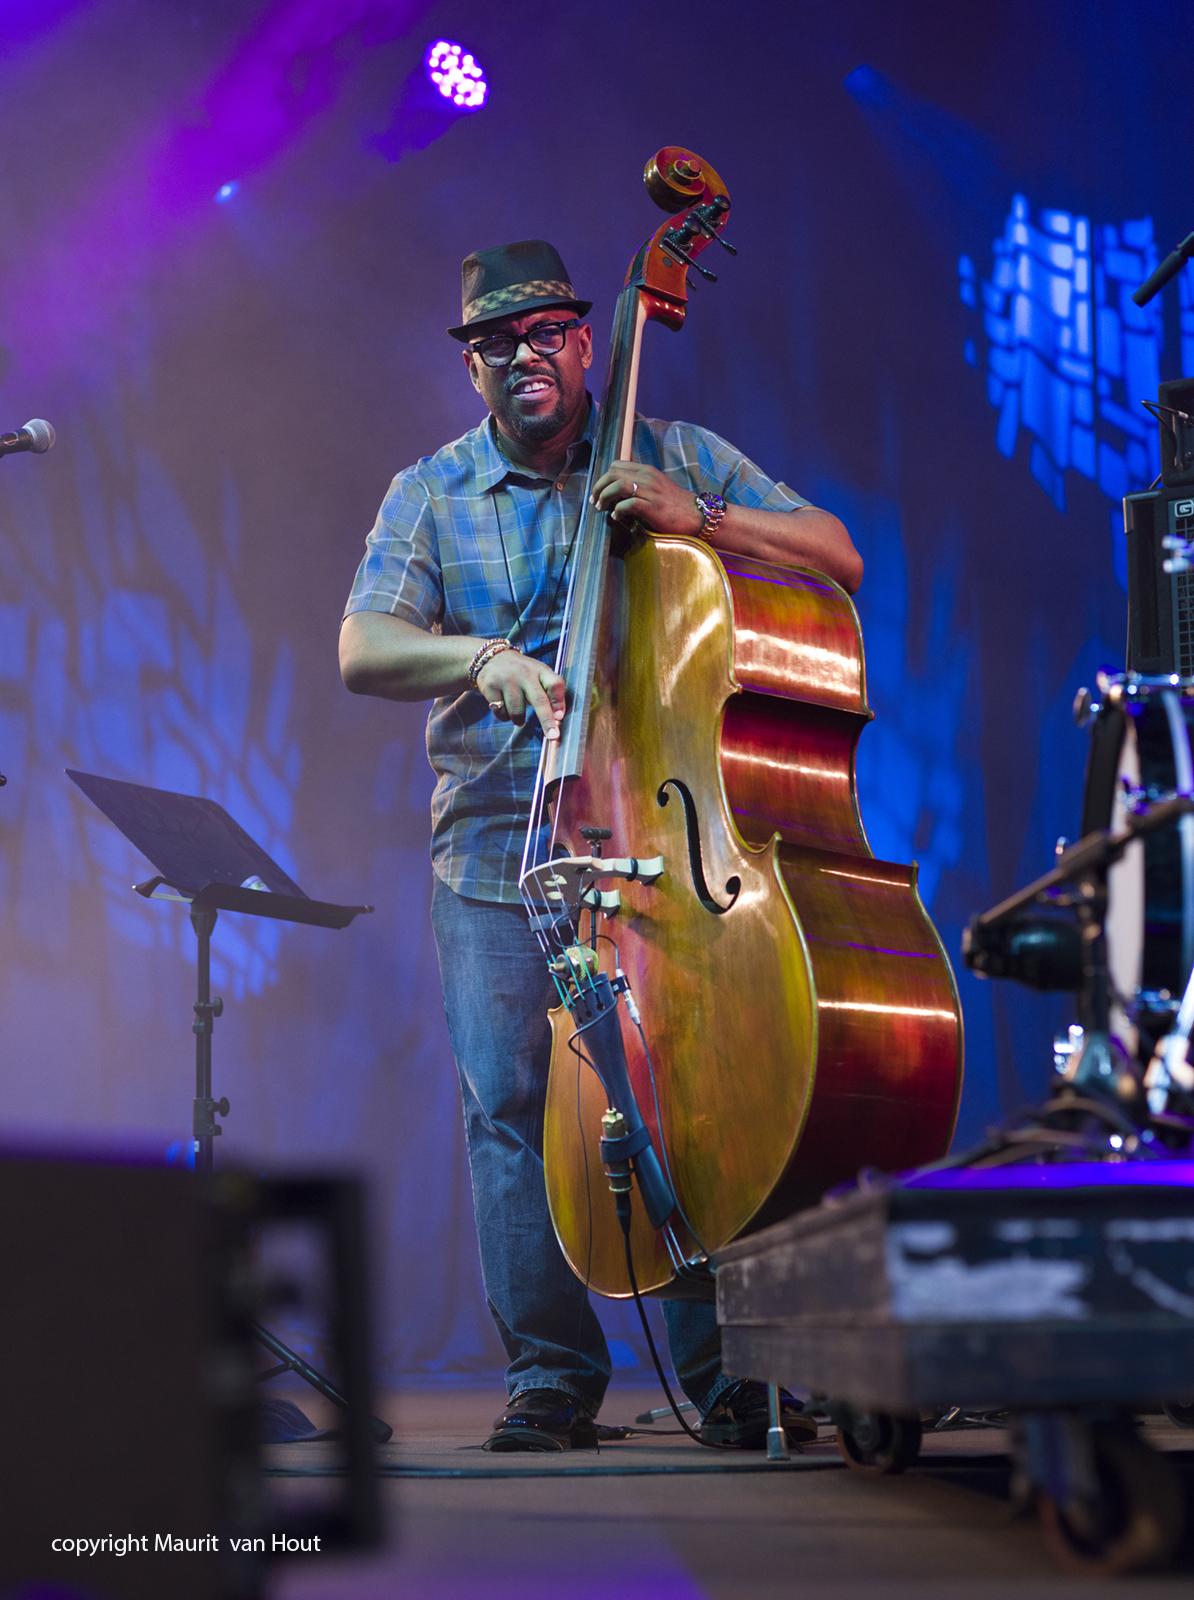 Christian Mc Bride live at Gent Jazz 2017